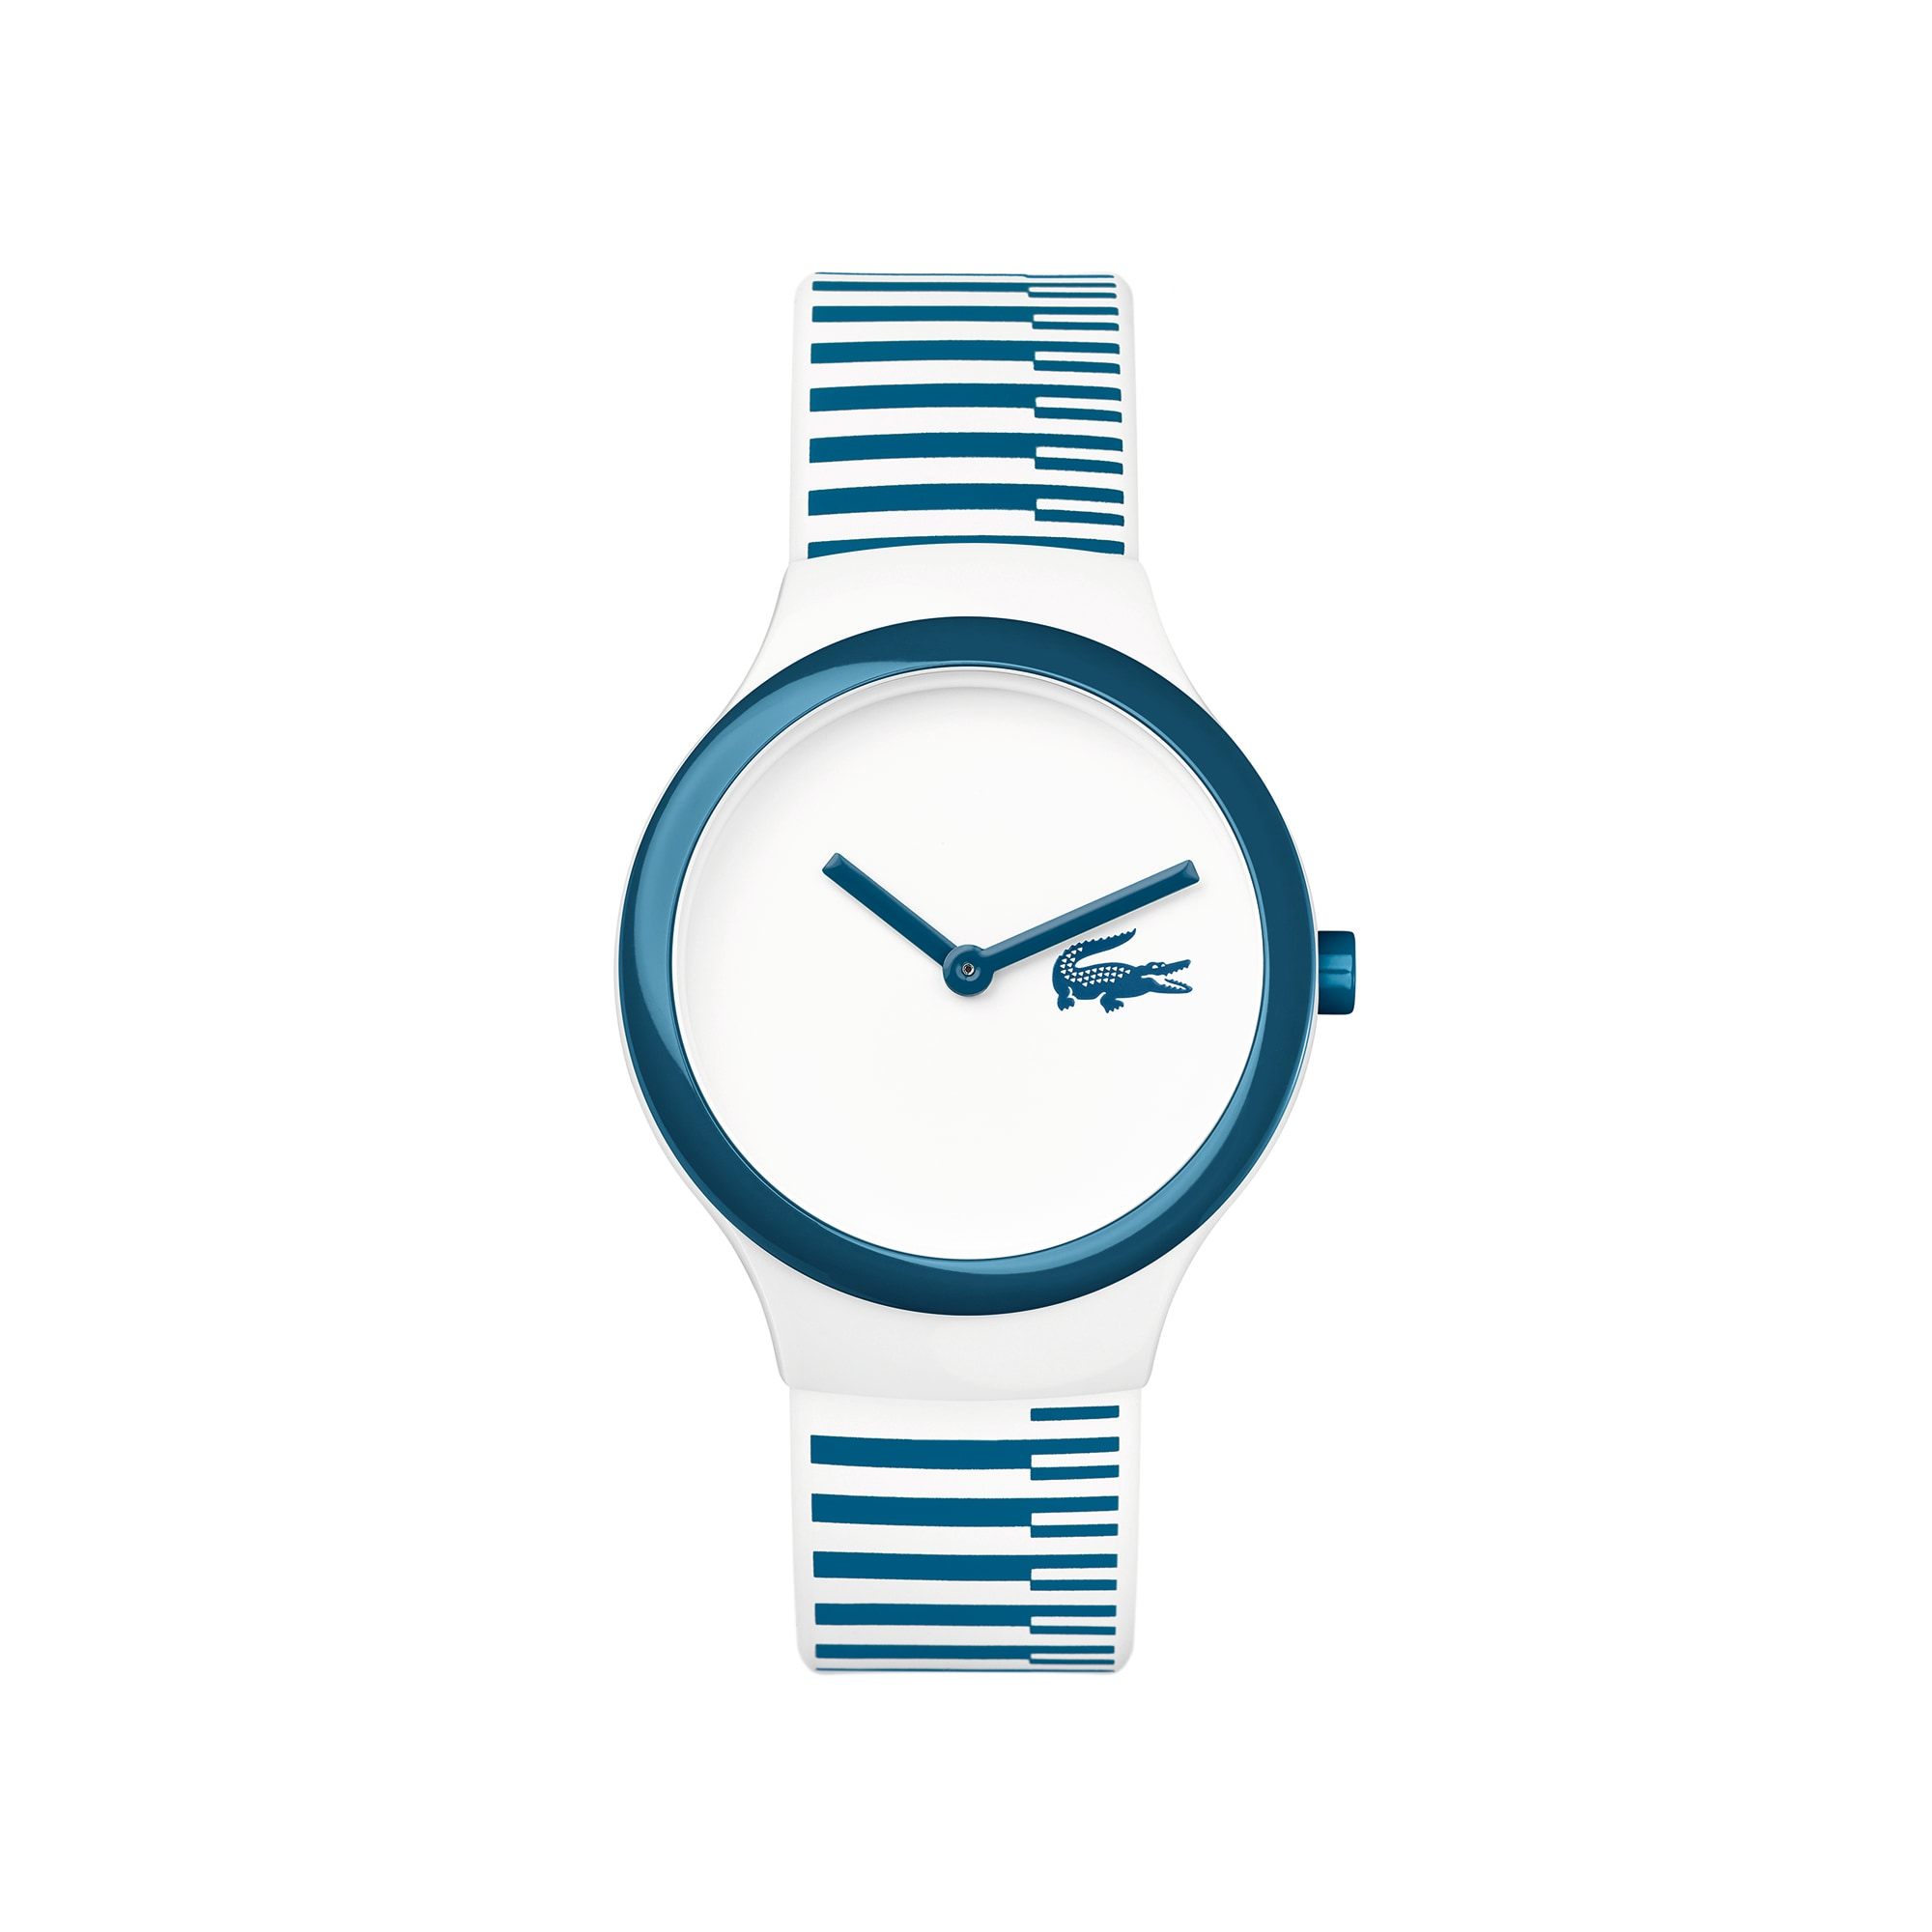 Orologio Goa NEW Bianco Righe blu